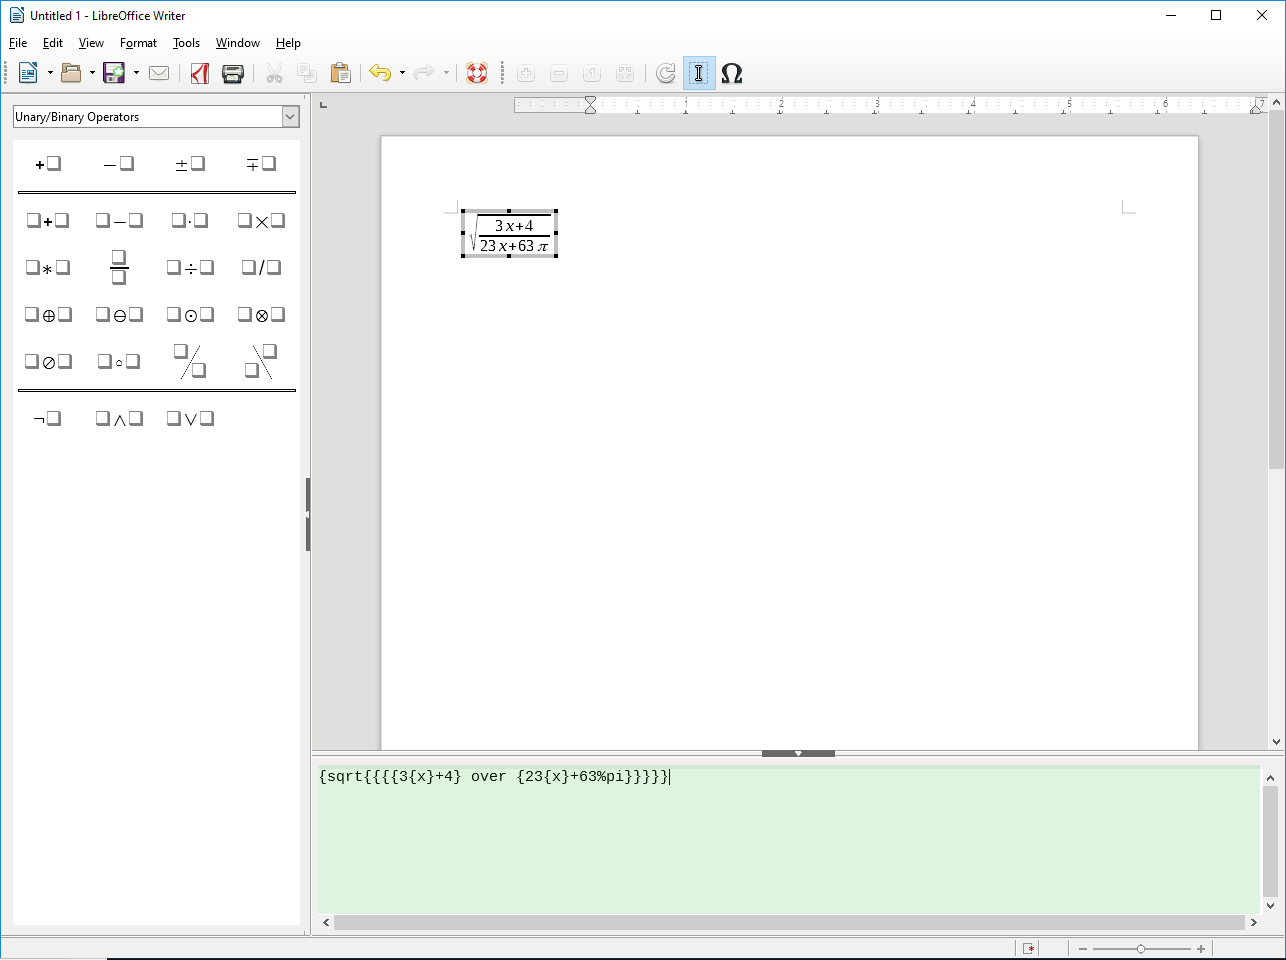 Past into LibreOffice Formula